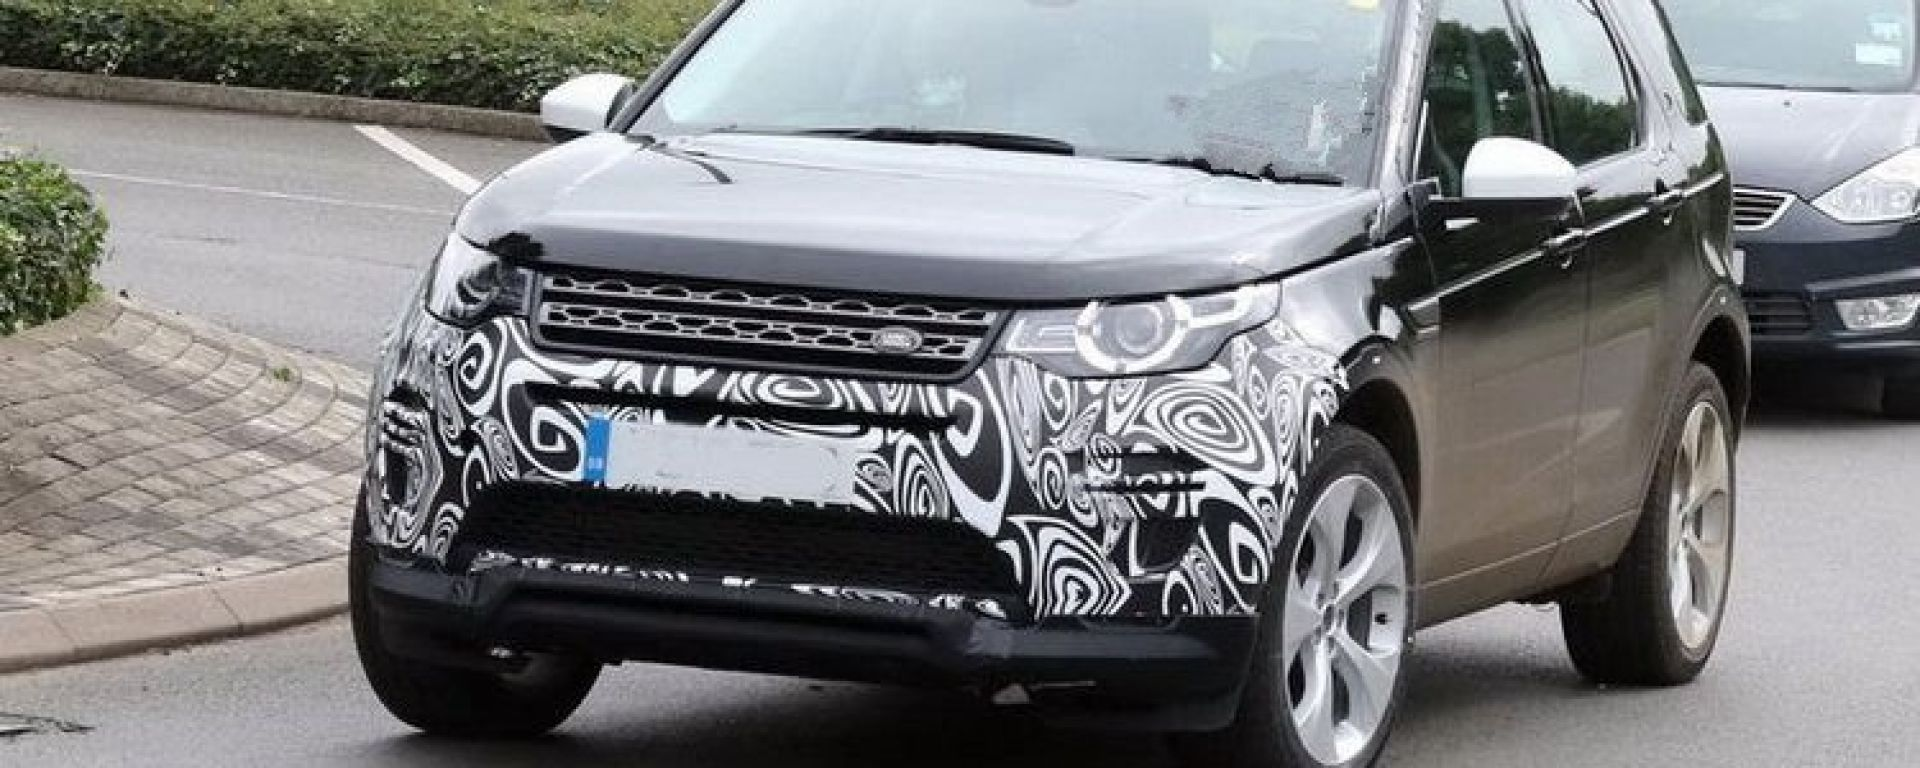 Land Rover nuova Discovery Sport 2018: restyling e ibrido ...